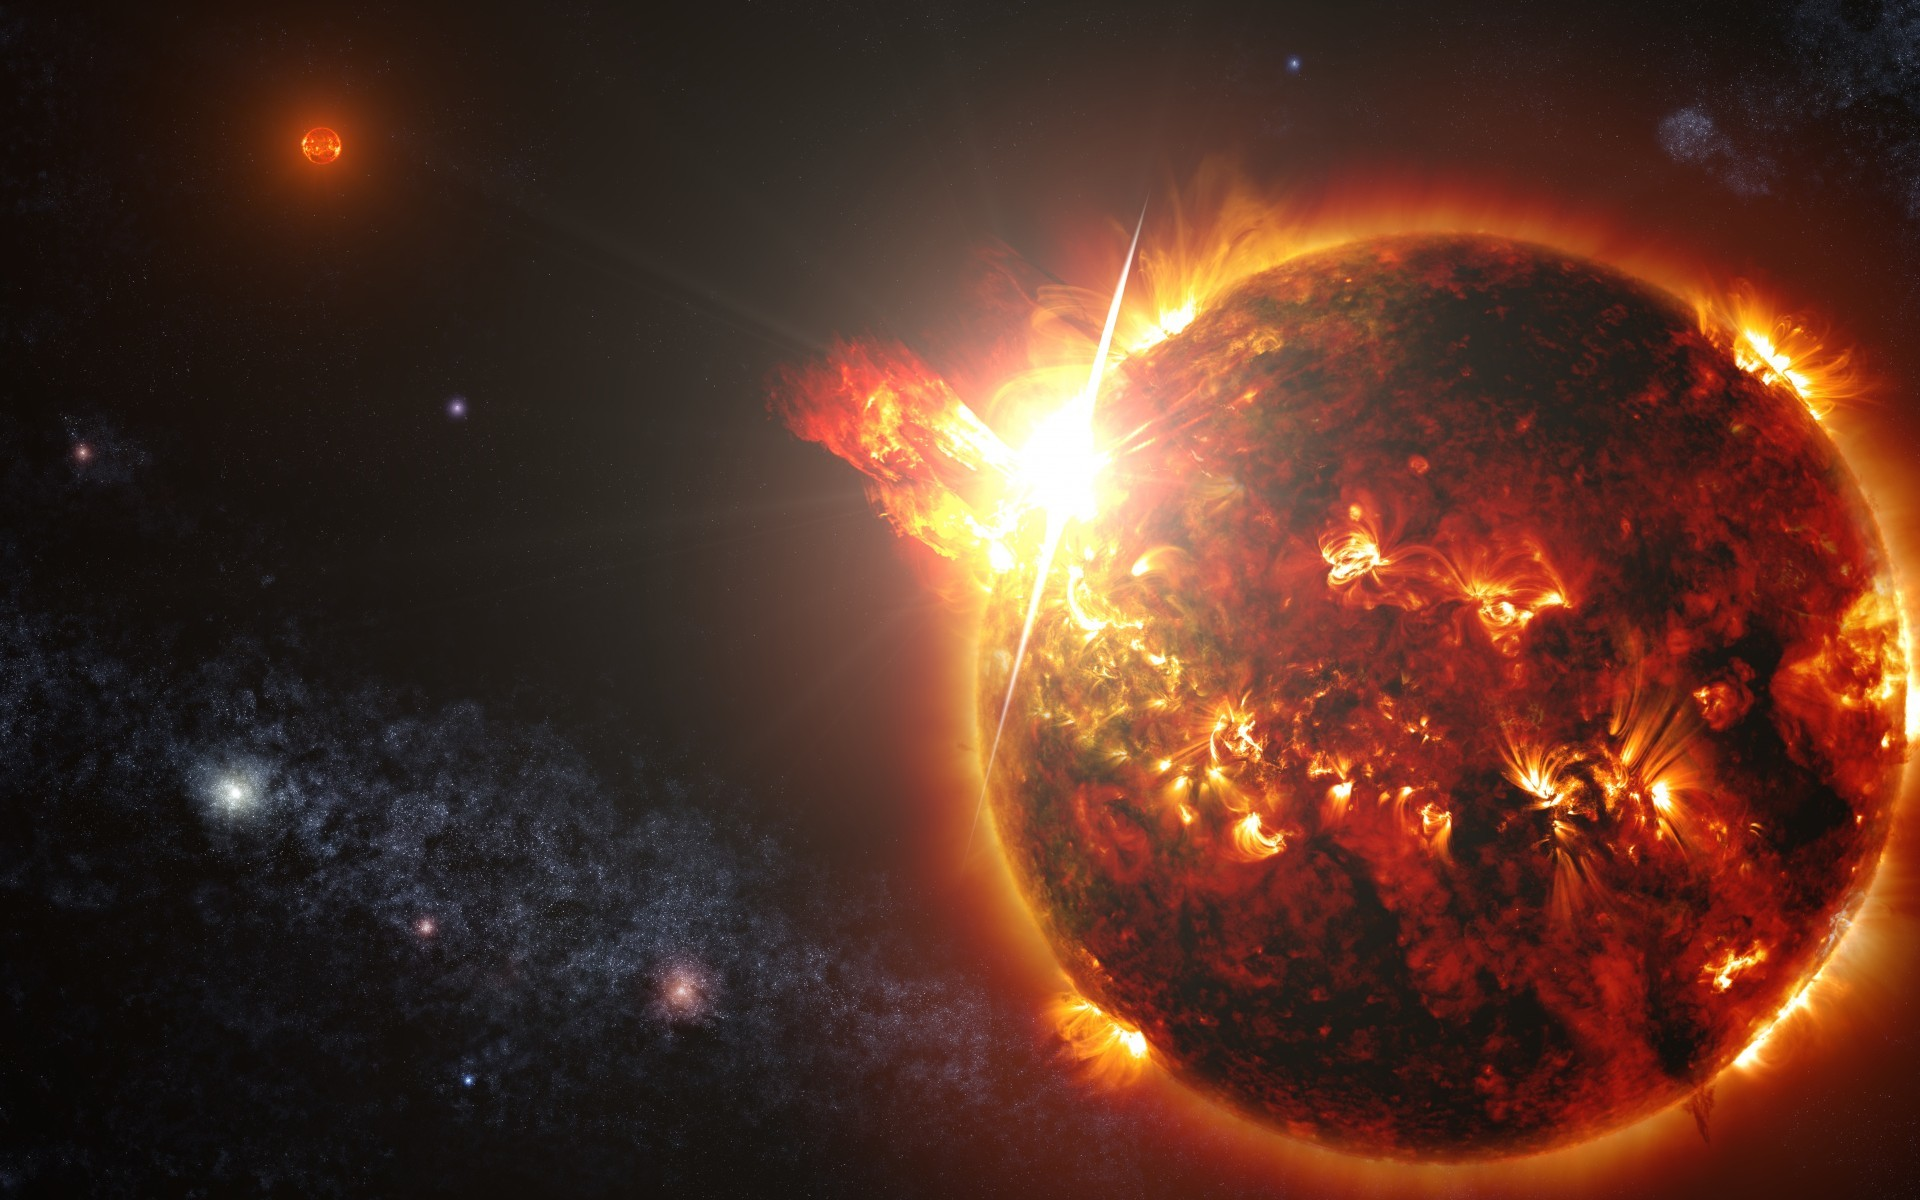 Space / Dwarf star Wallpaper